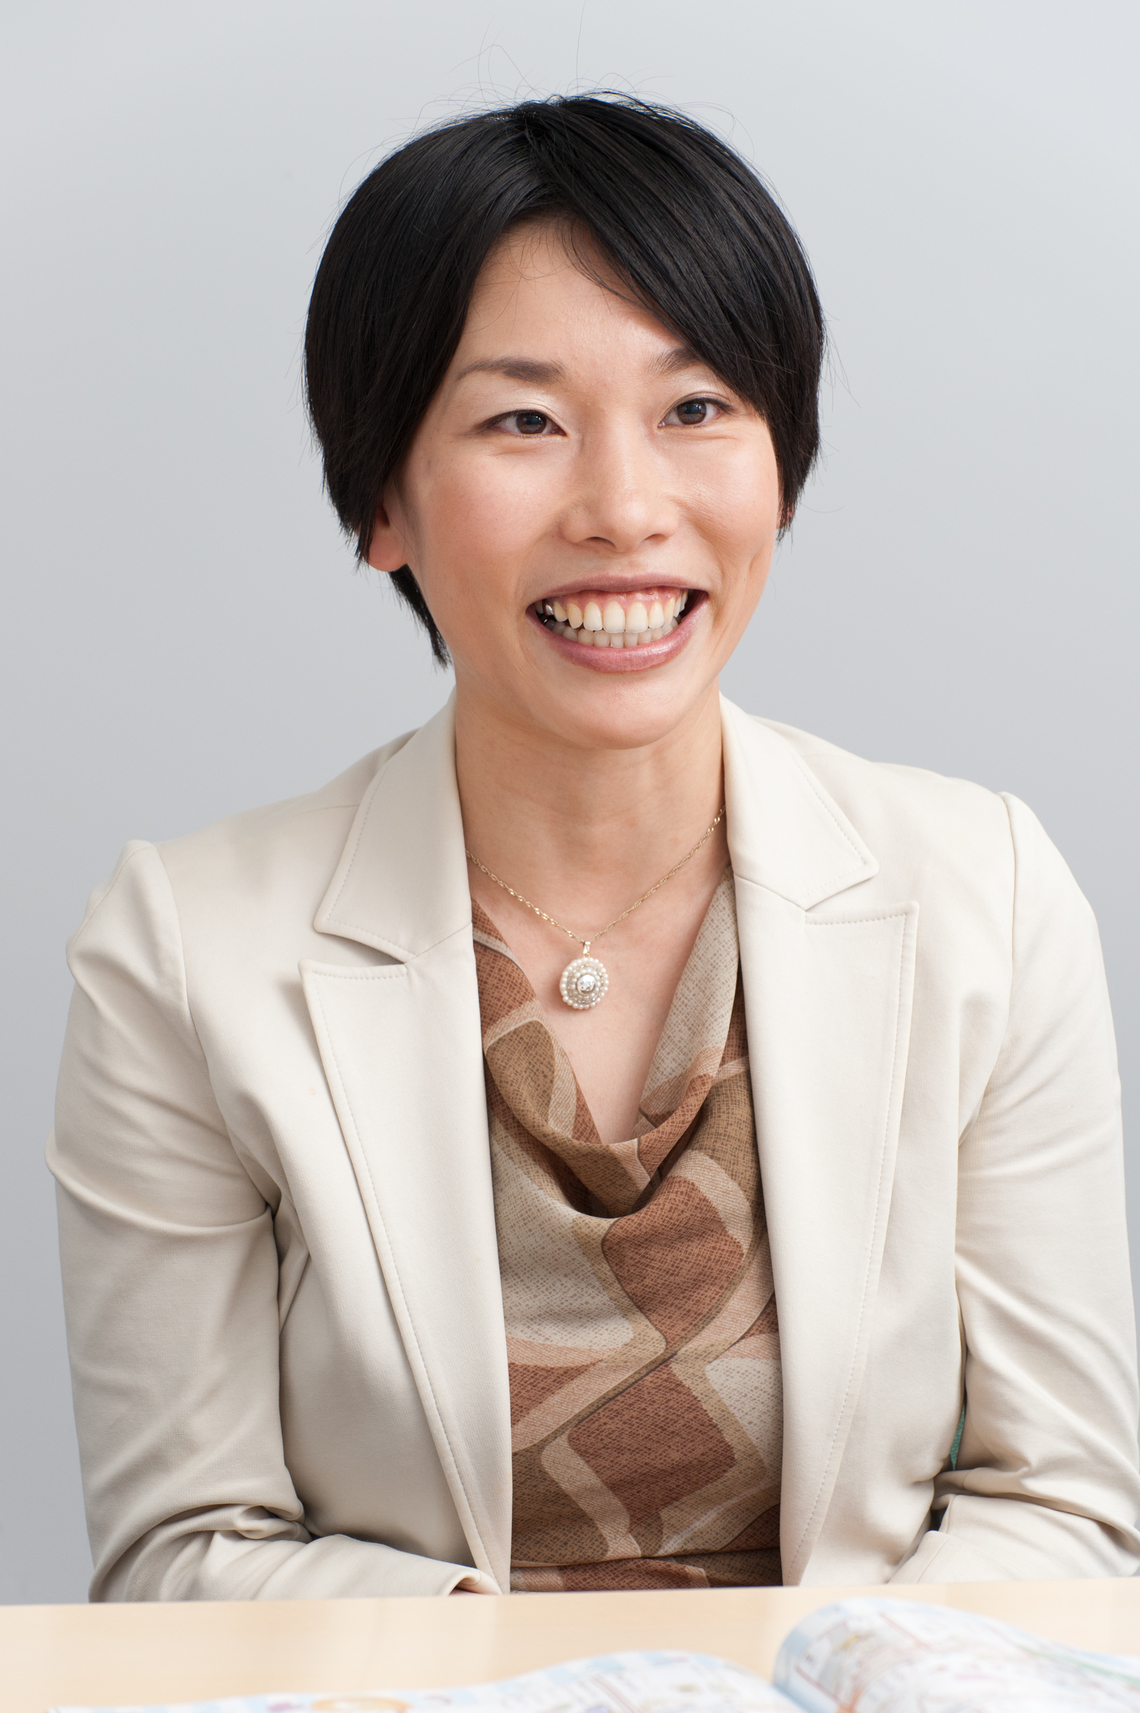 電通総研ママラボの主任研究員・田中理絵氏